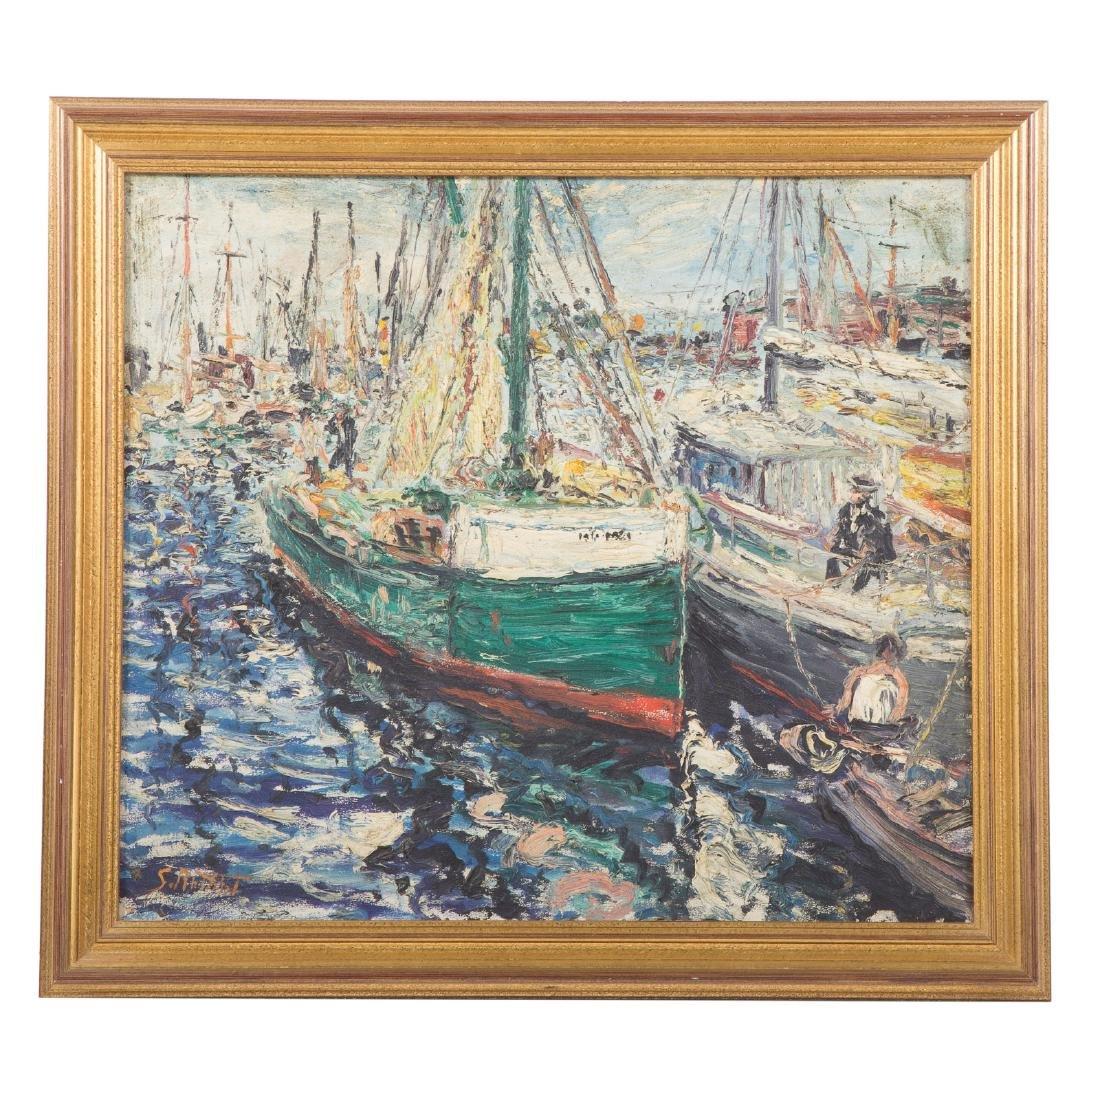 Samuel Rothbort. Impressionistic Harbor Scene